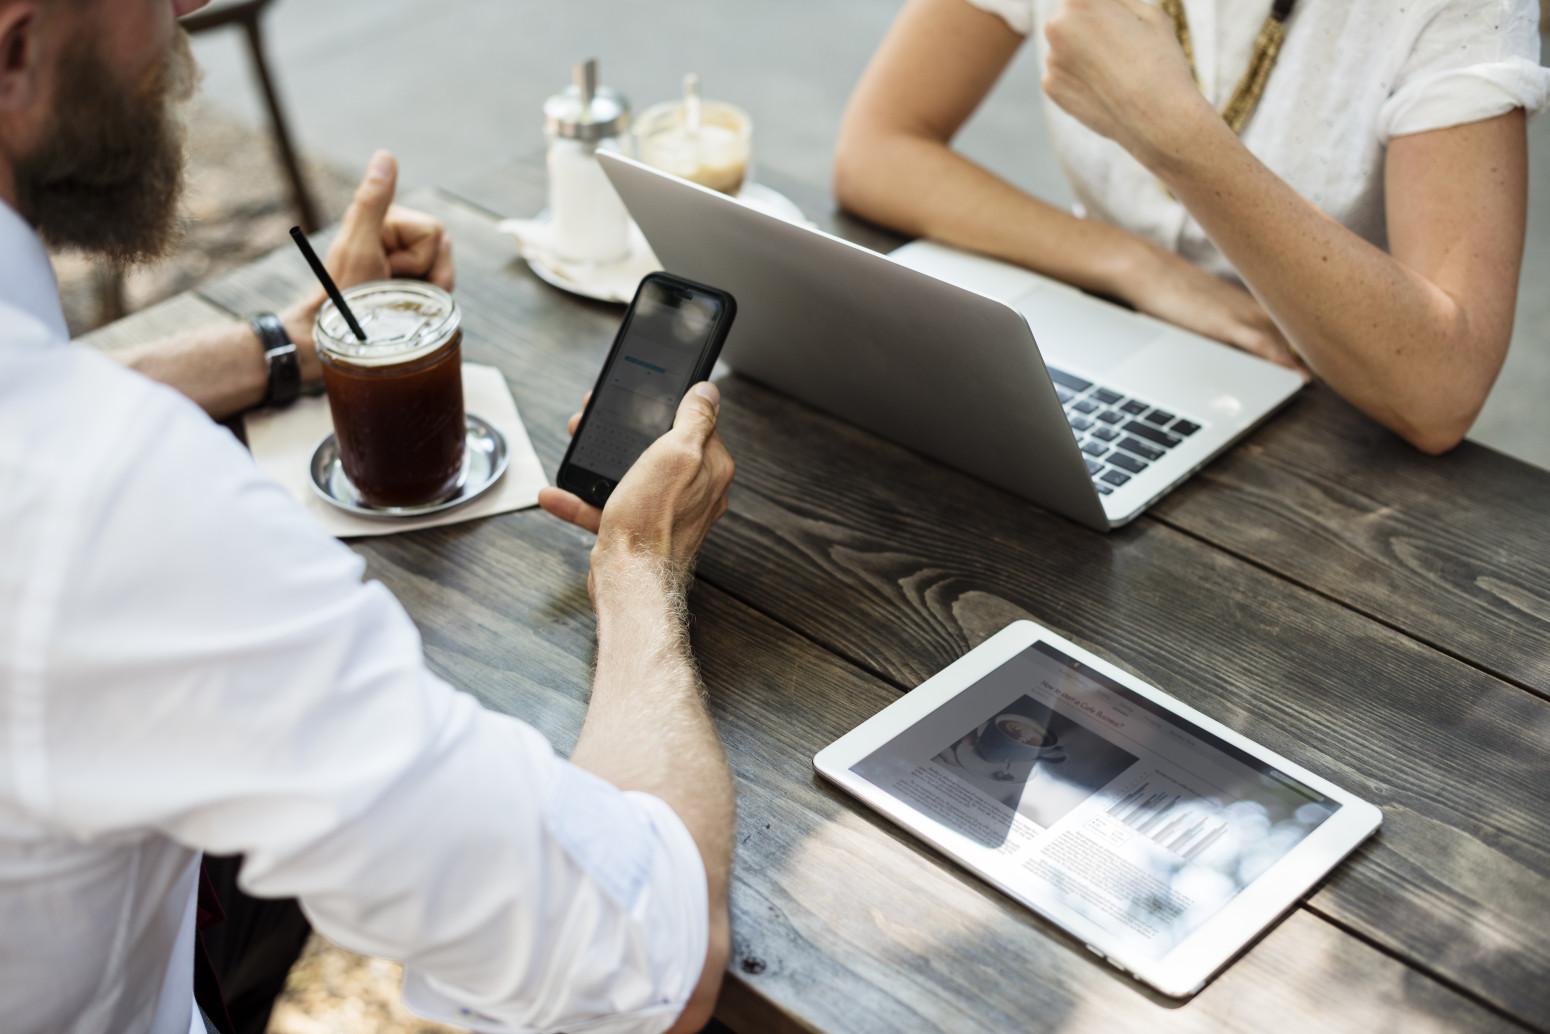 Social Revelation Marketing: Increasing Social Media Performance in 2018 – with Digital Entrepreneur Ryan White